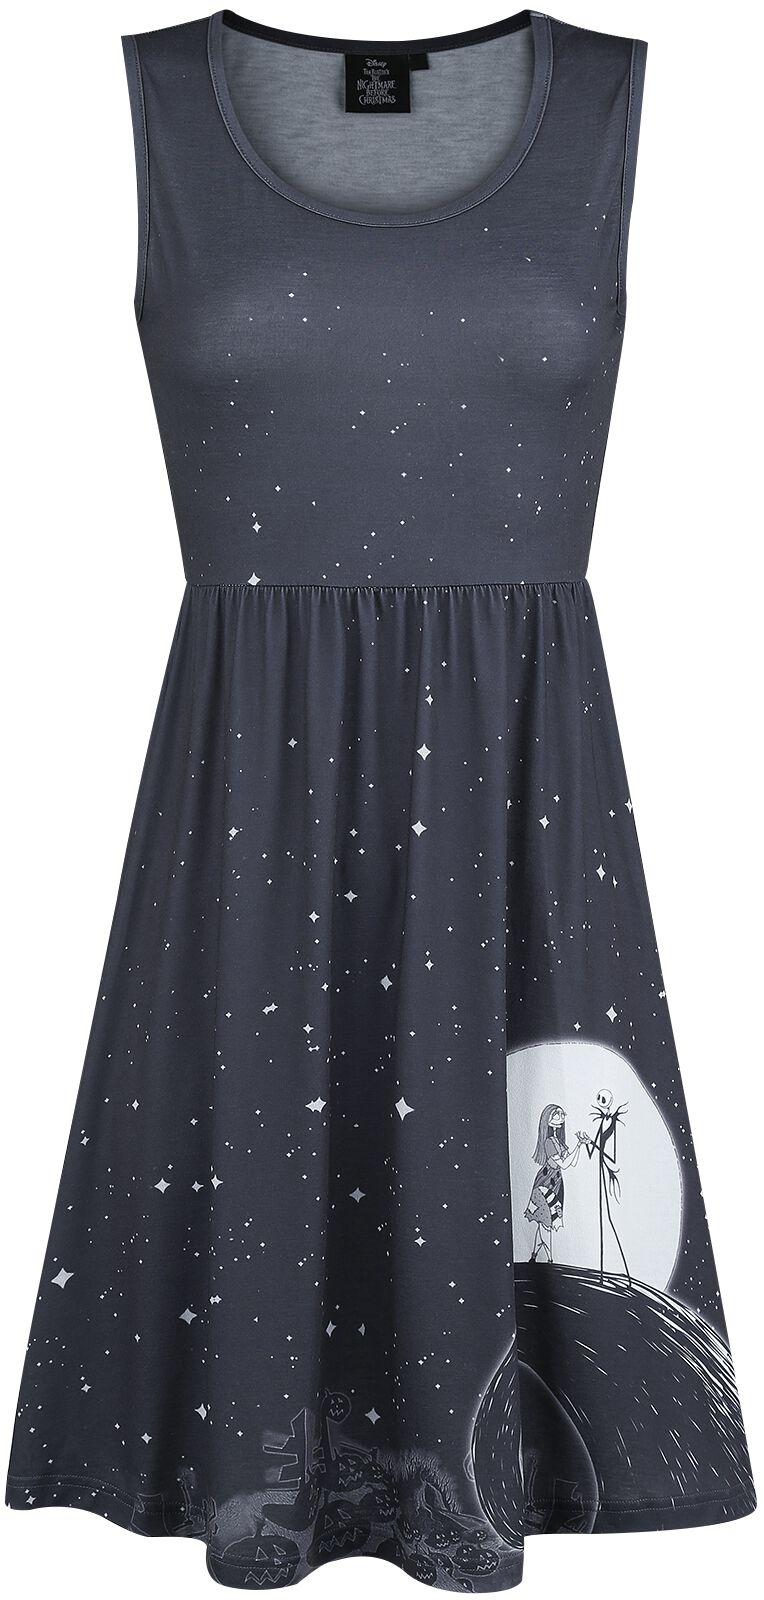 Image of   The Nightmare Before Christmas Moon & Stars Kjole sort